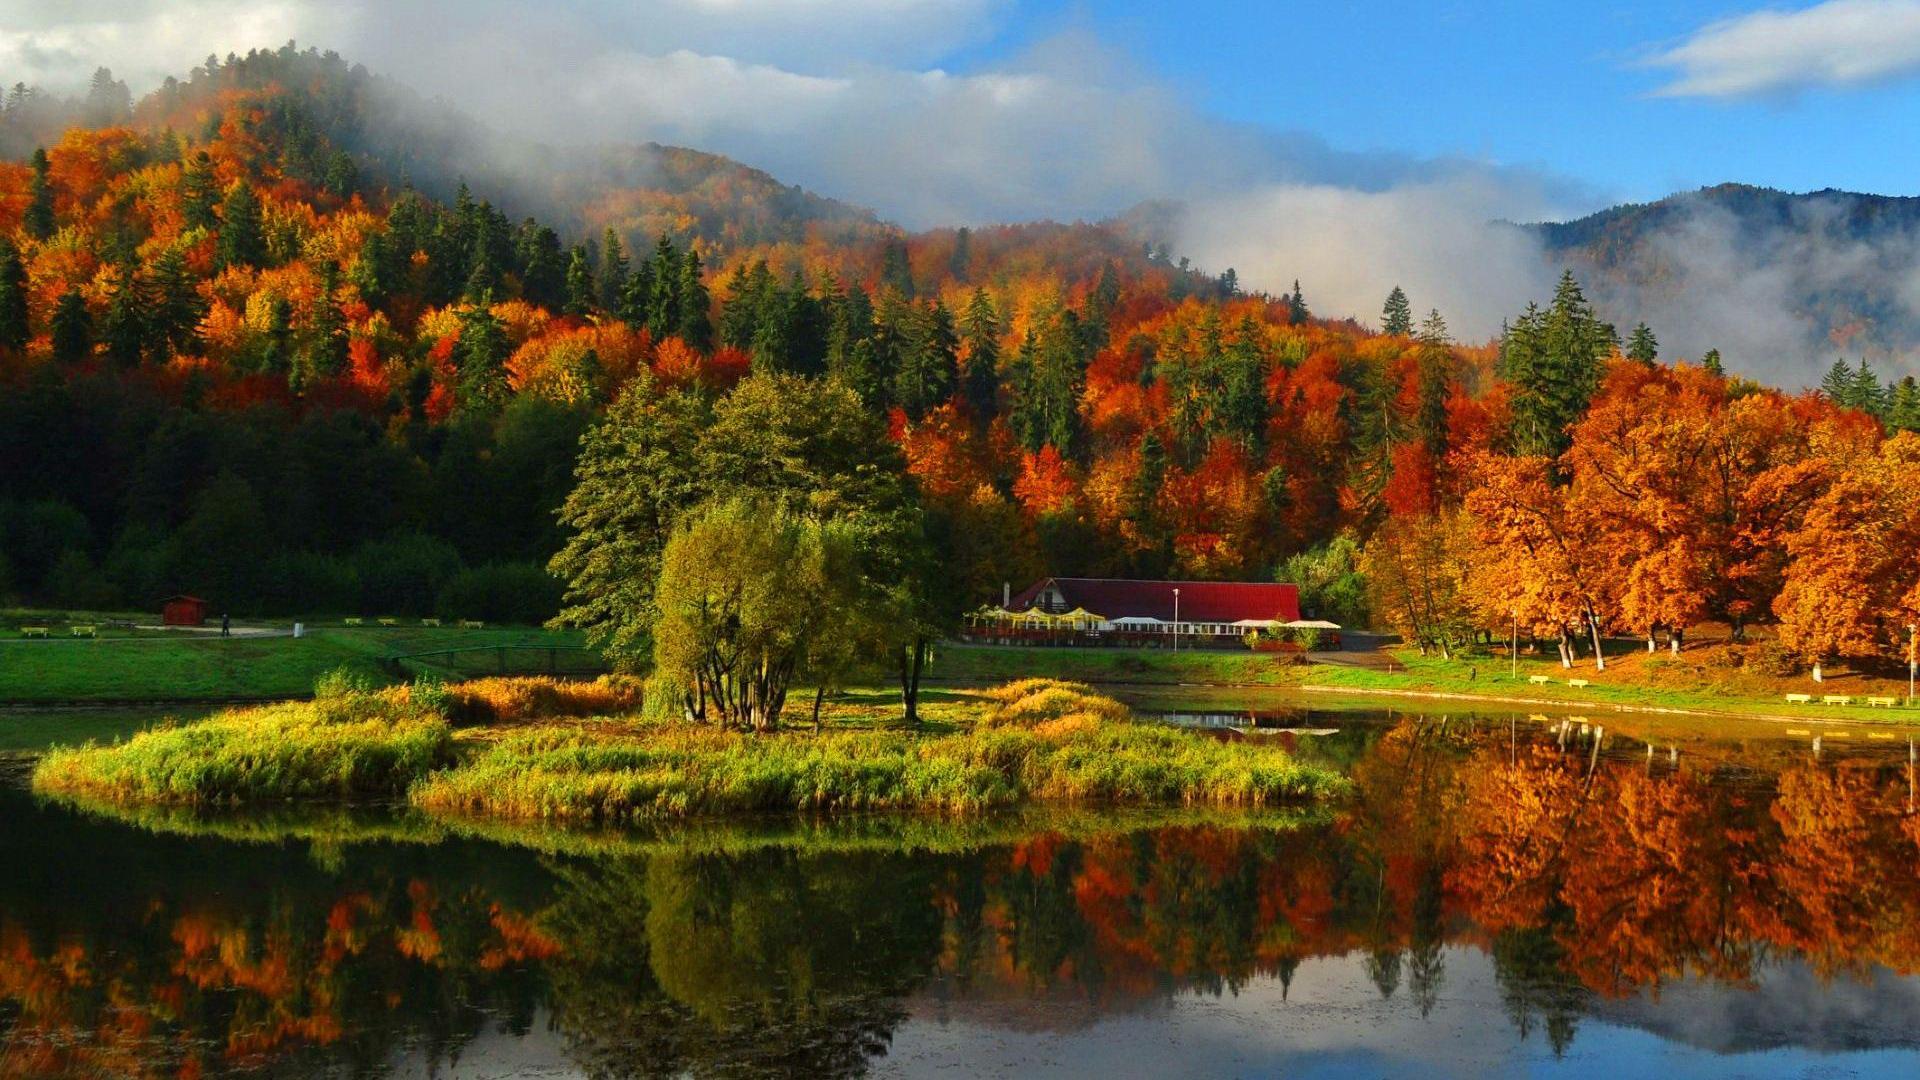 Golf Course Fall Season Wallpaper Pc Autumn Wallpaper Hd Let You Feel The Magic Of Fall